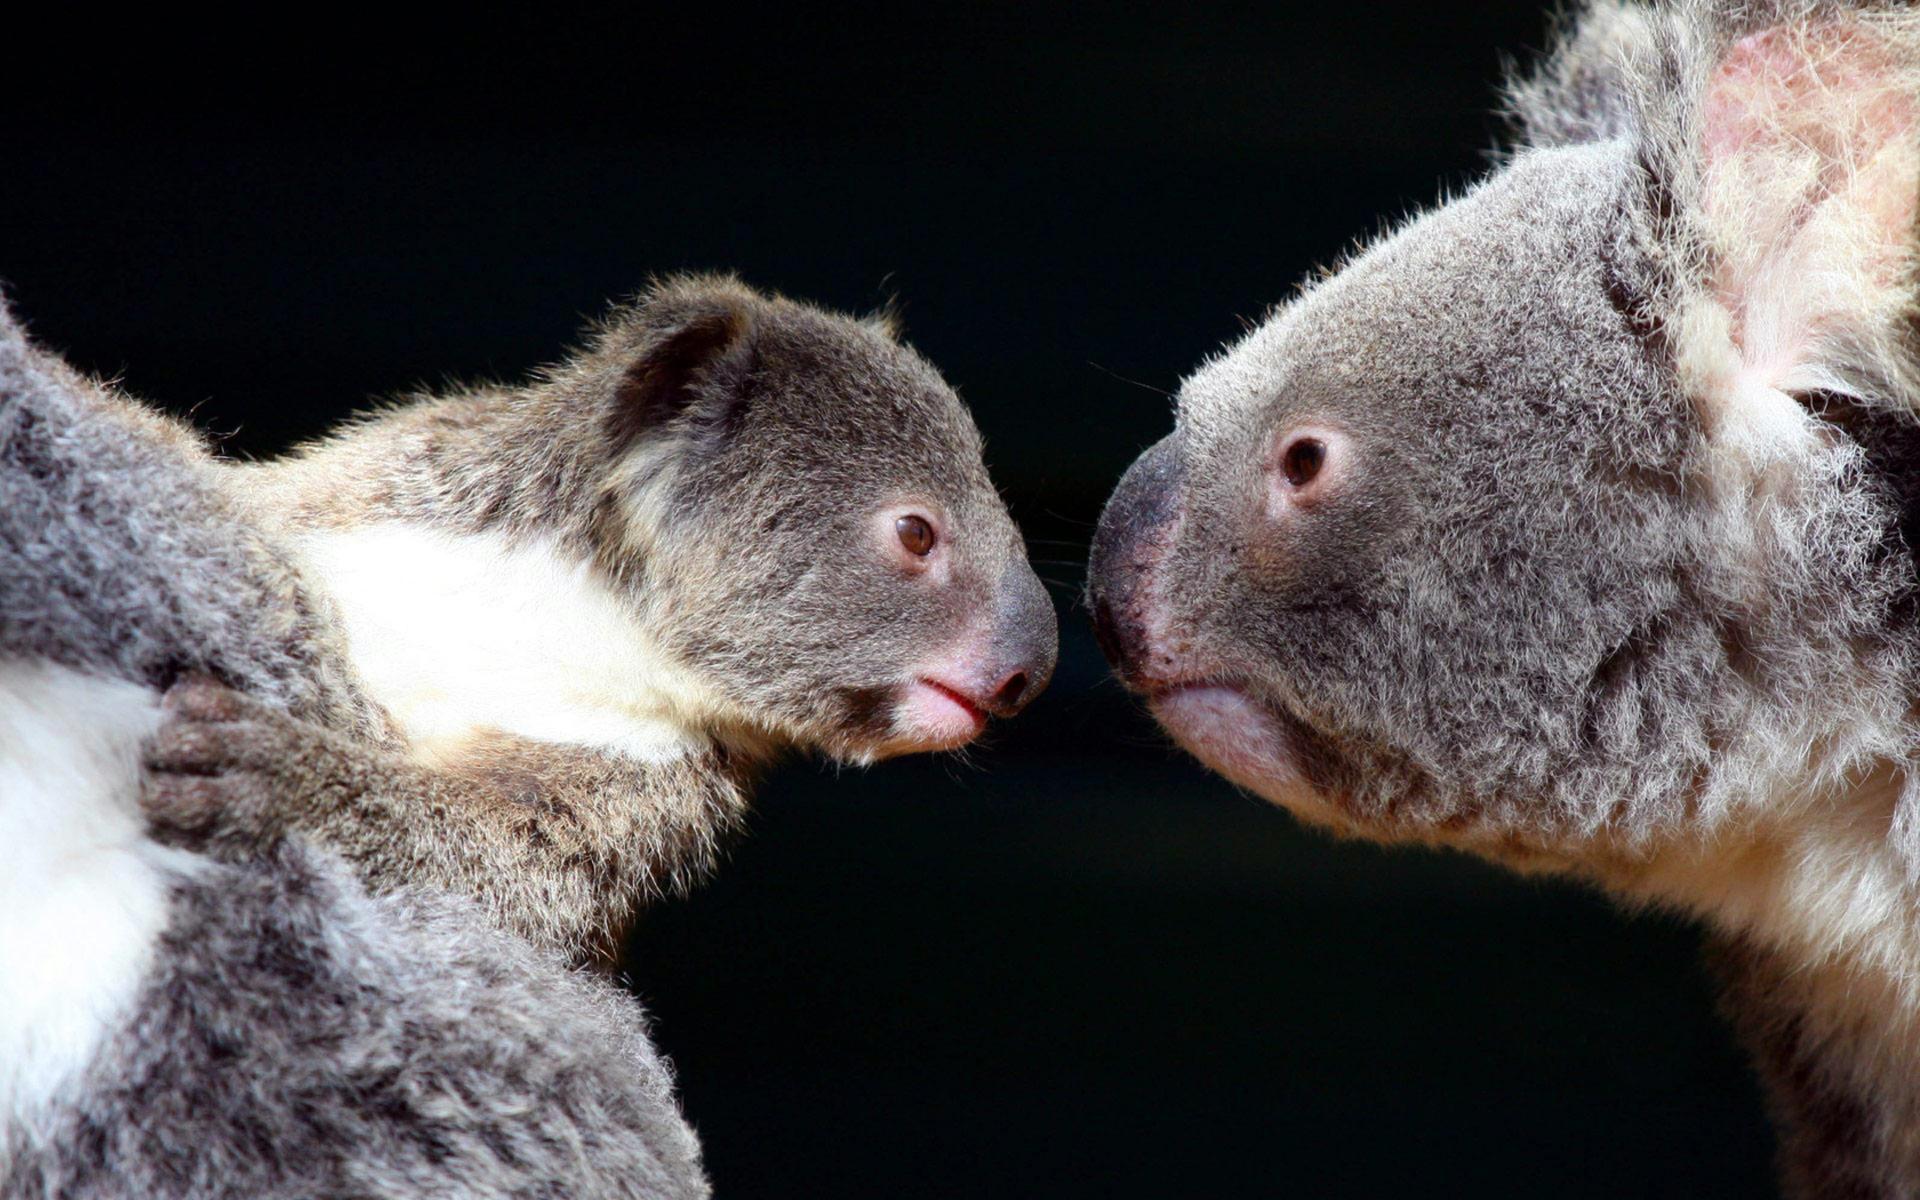 Wallpapers ⇒ Animals ⇒ Koala Wallpaper